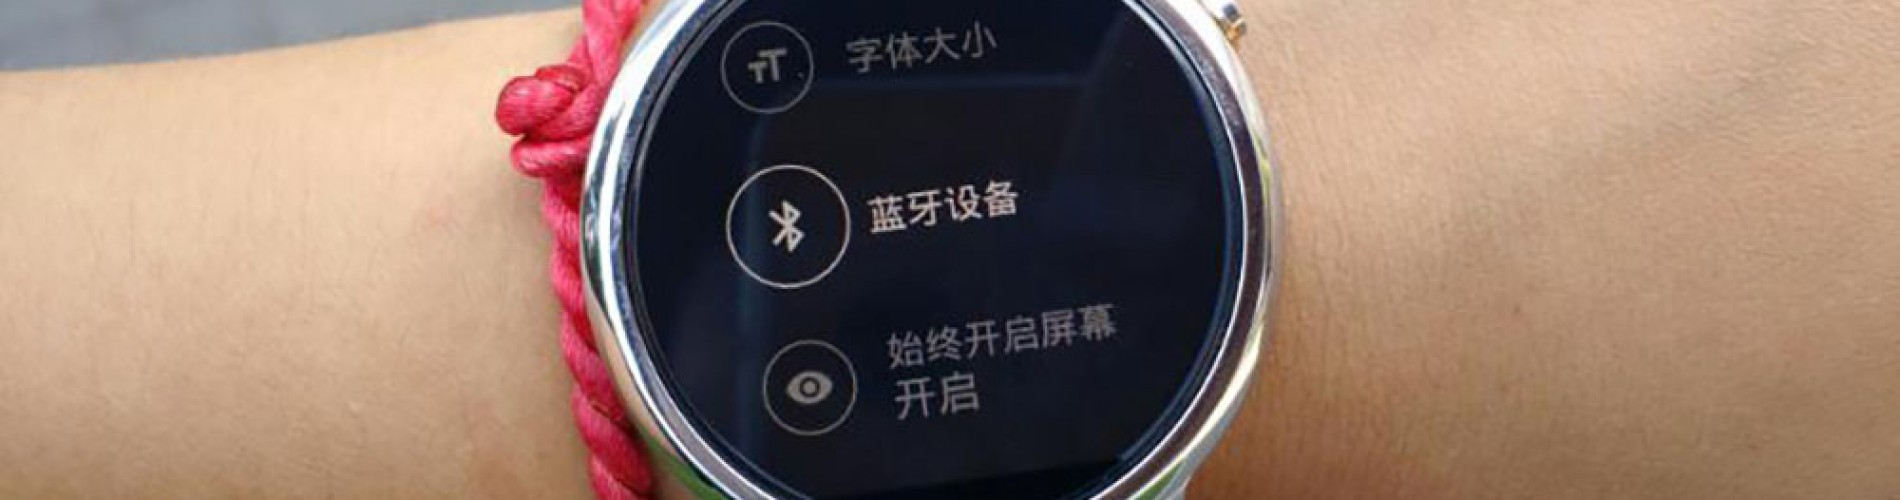 Motorola sending out invites for Moto 360 reveal event